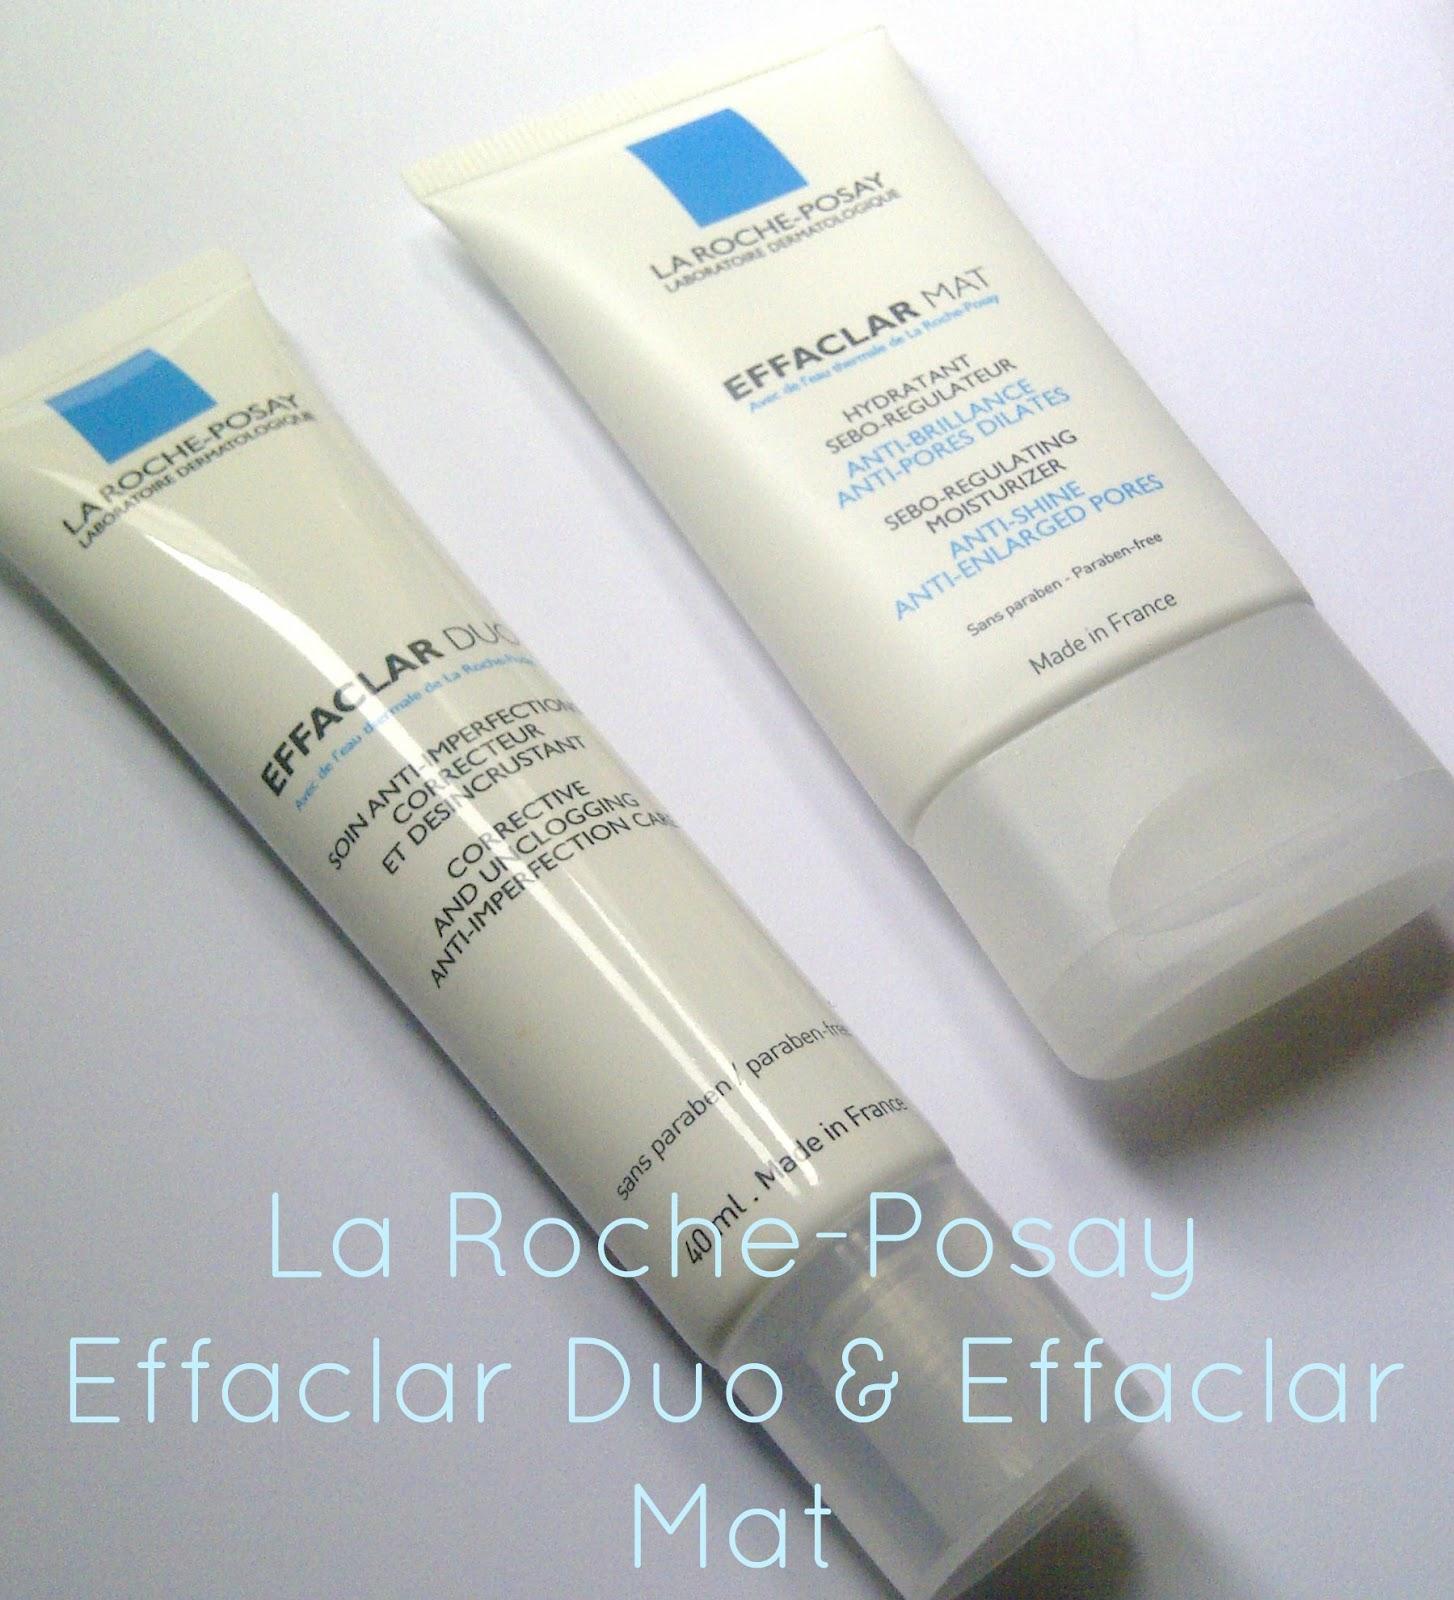 regulating mats mat la image effaclar in moisturizer sebo reviews roche posay item gallery